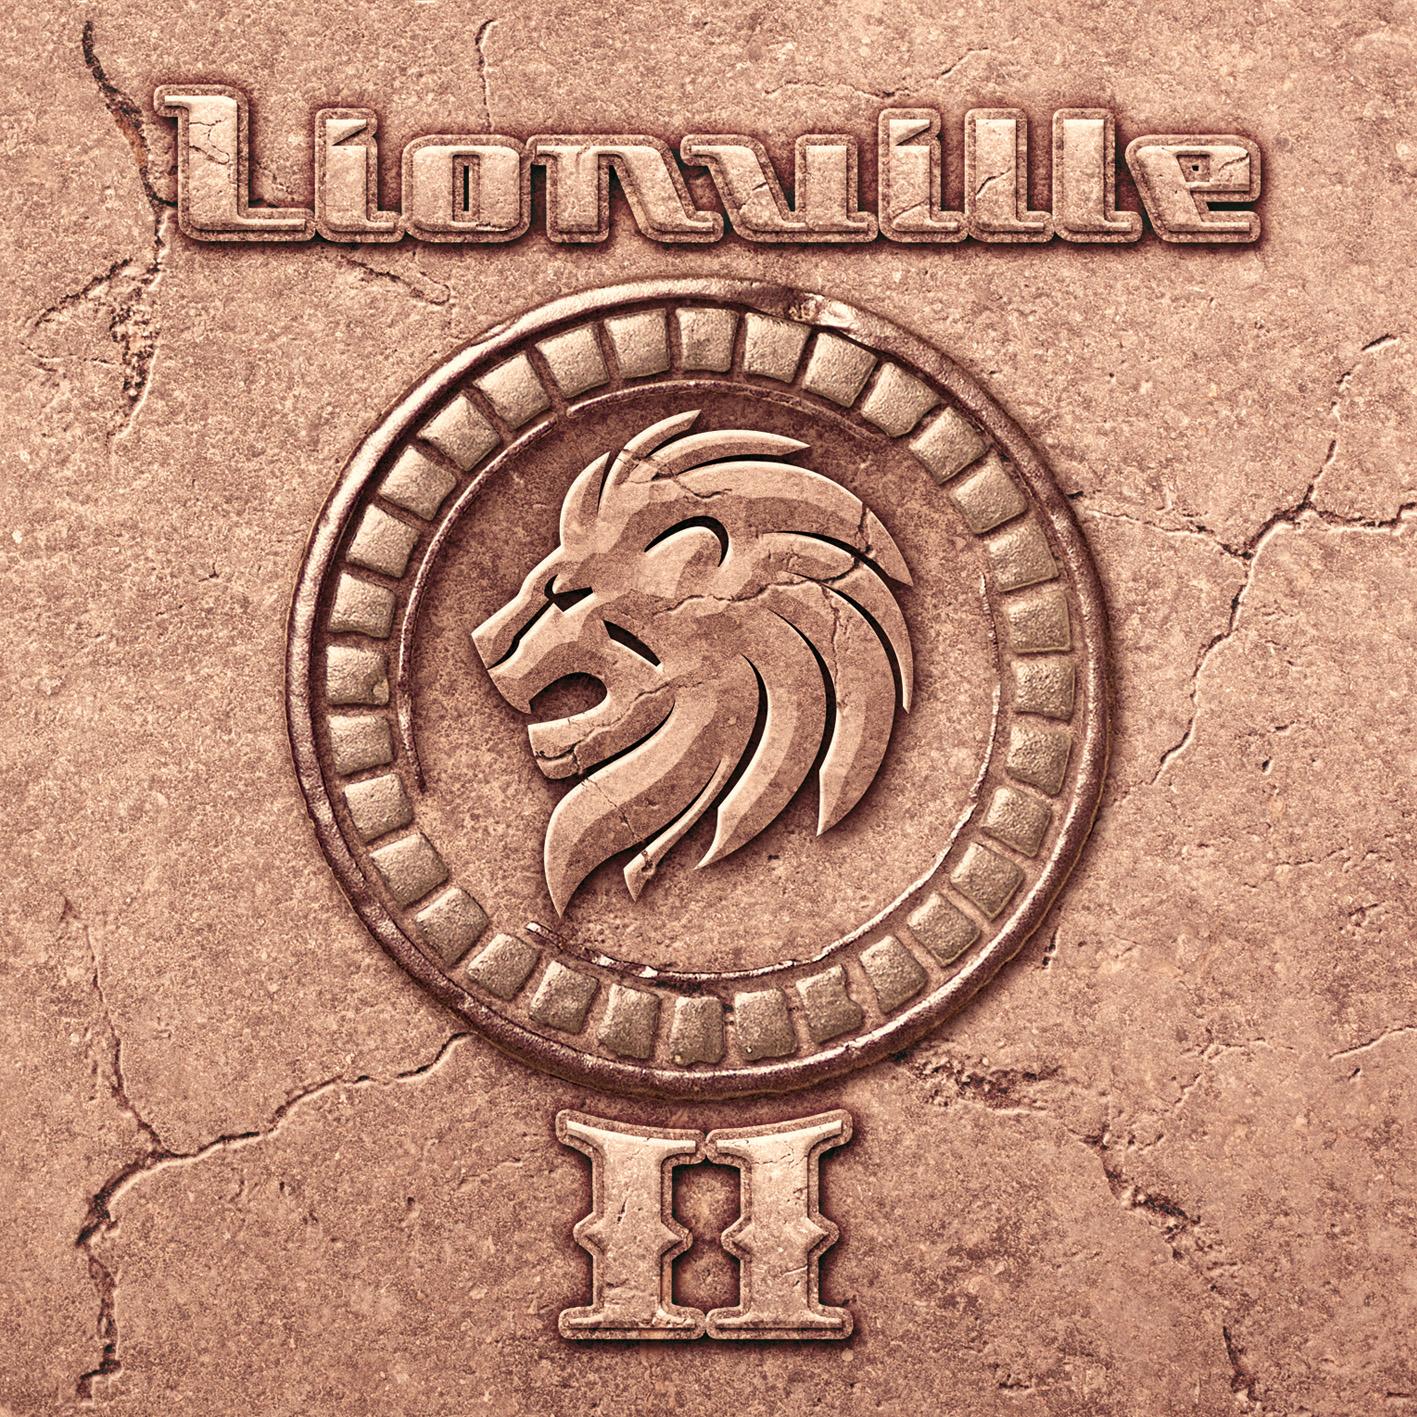 Y Lionville chesyrockreviews.com: ...